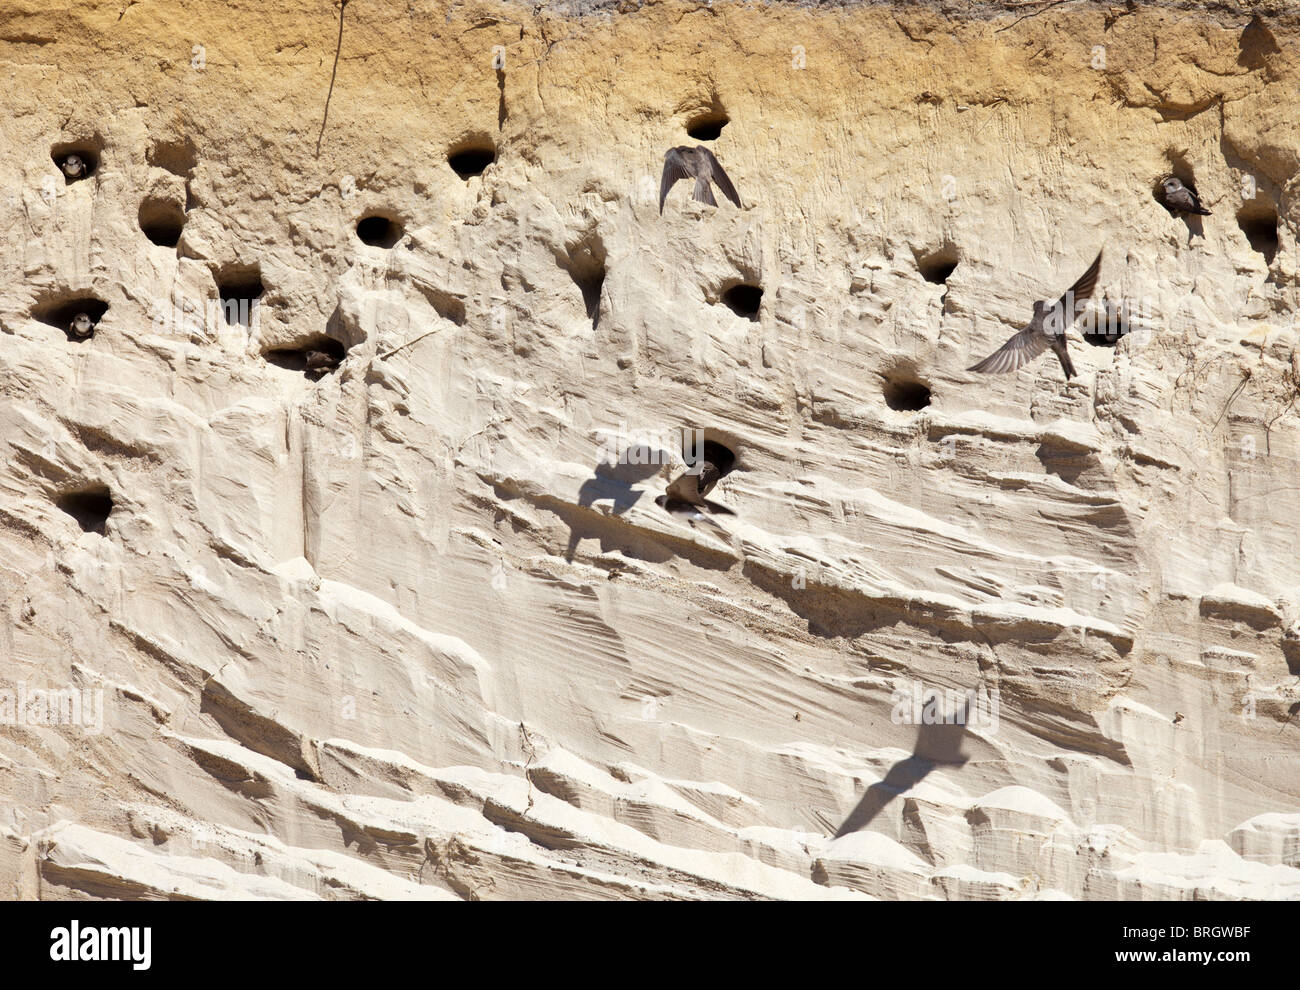 Sand Martin ( Riparia Riparia ) swallow nesting site on a sandbank wall - Stock Image